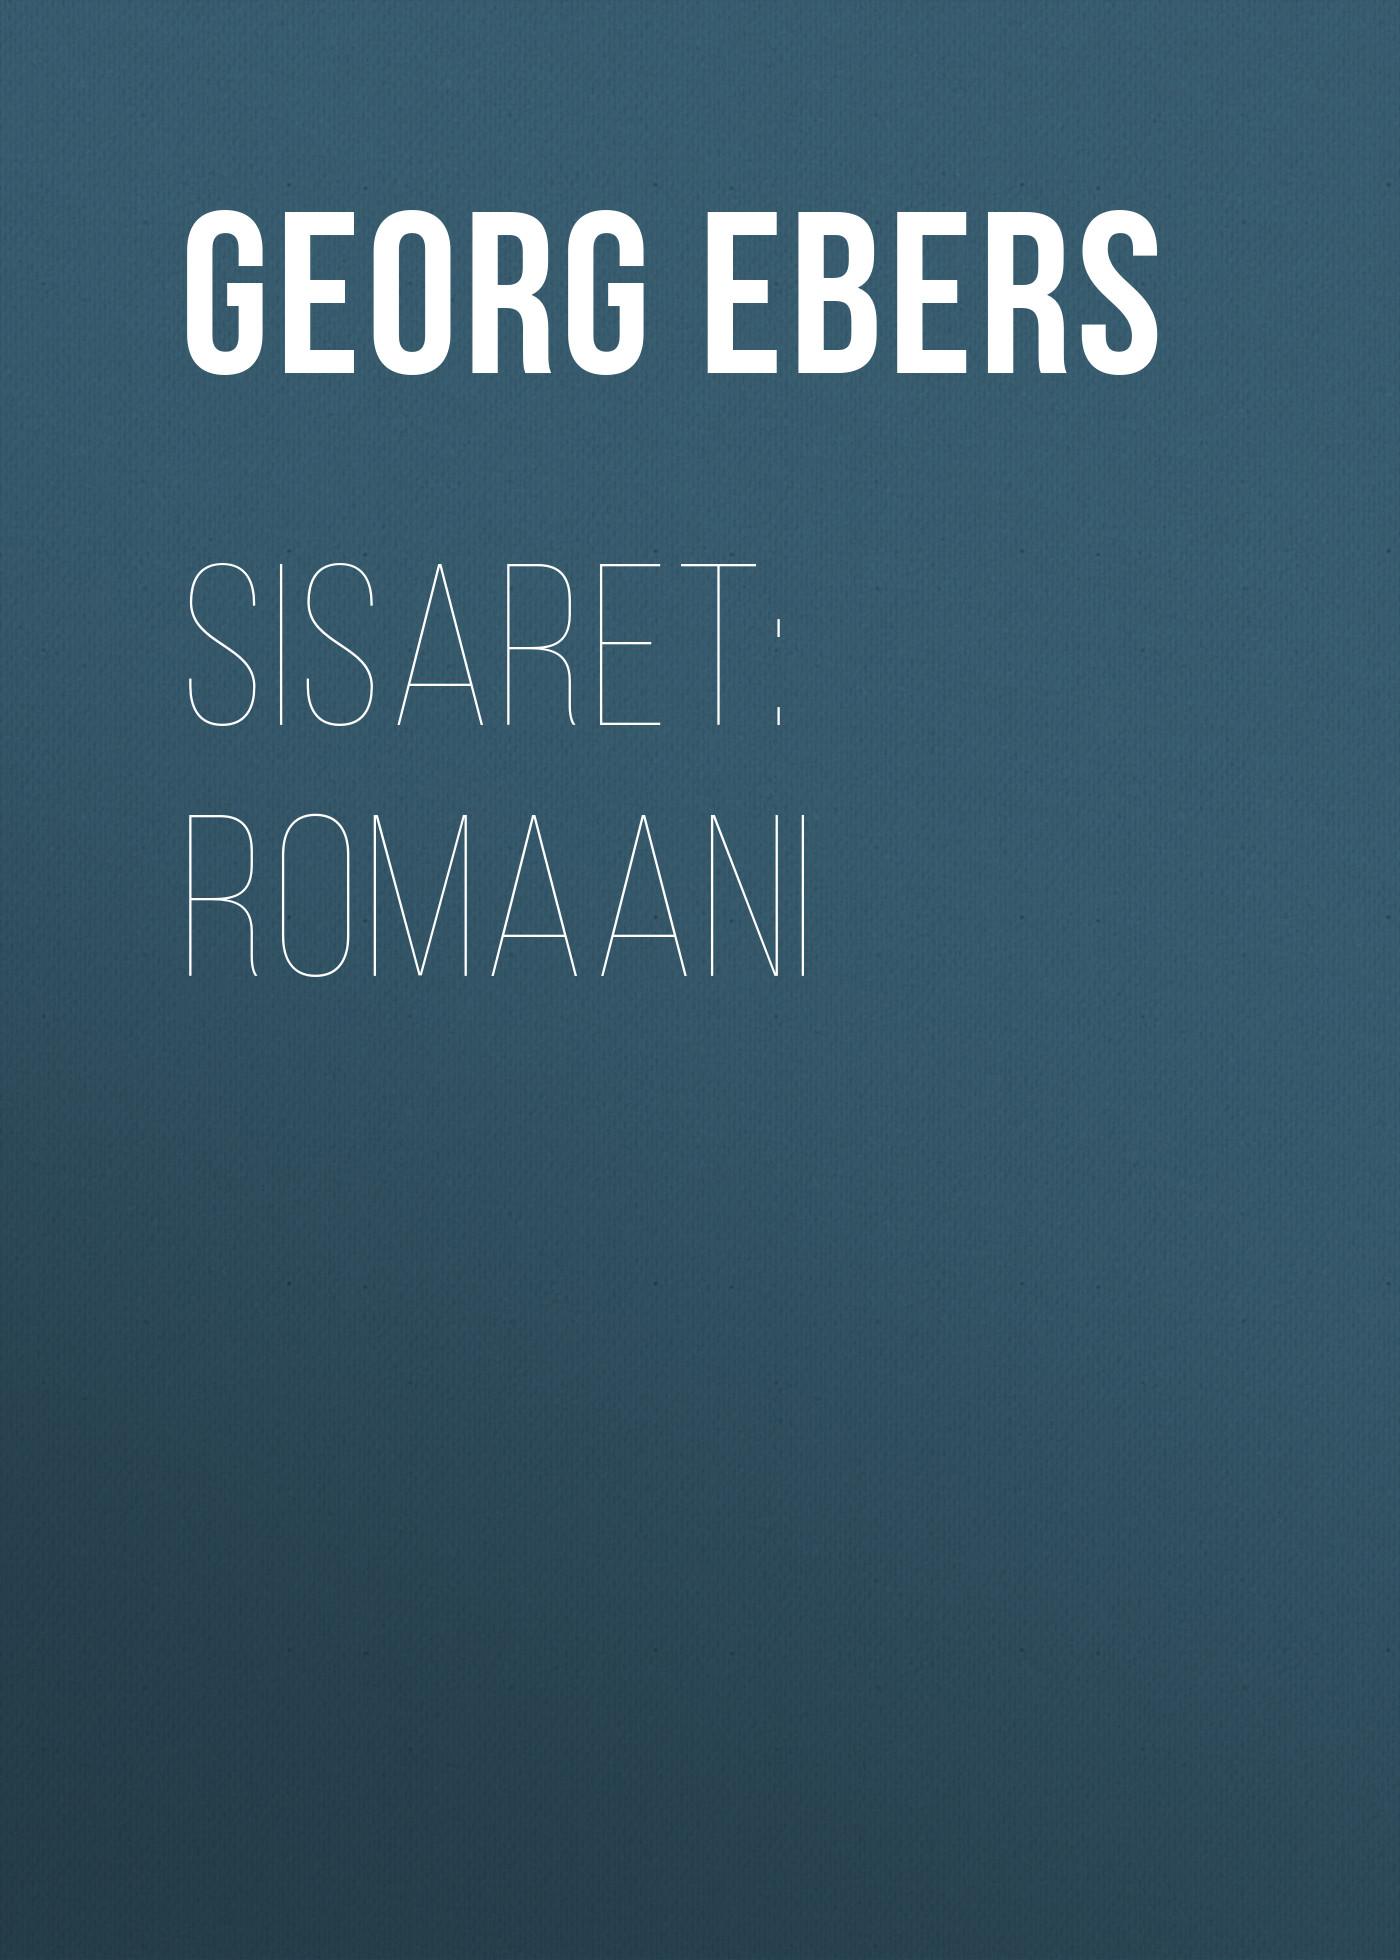 Georg Ebers Sisaret: Romaani georg ebers antike portraits die hellenistischen bildnisse aus dem fajjum